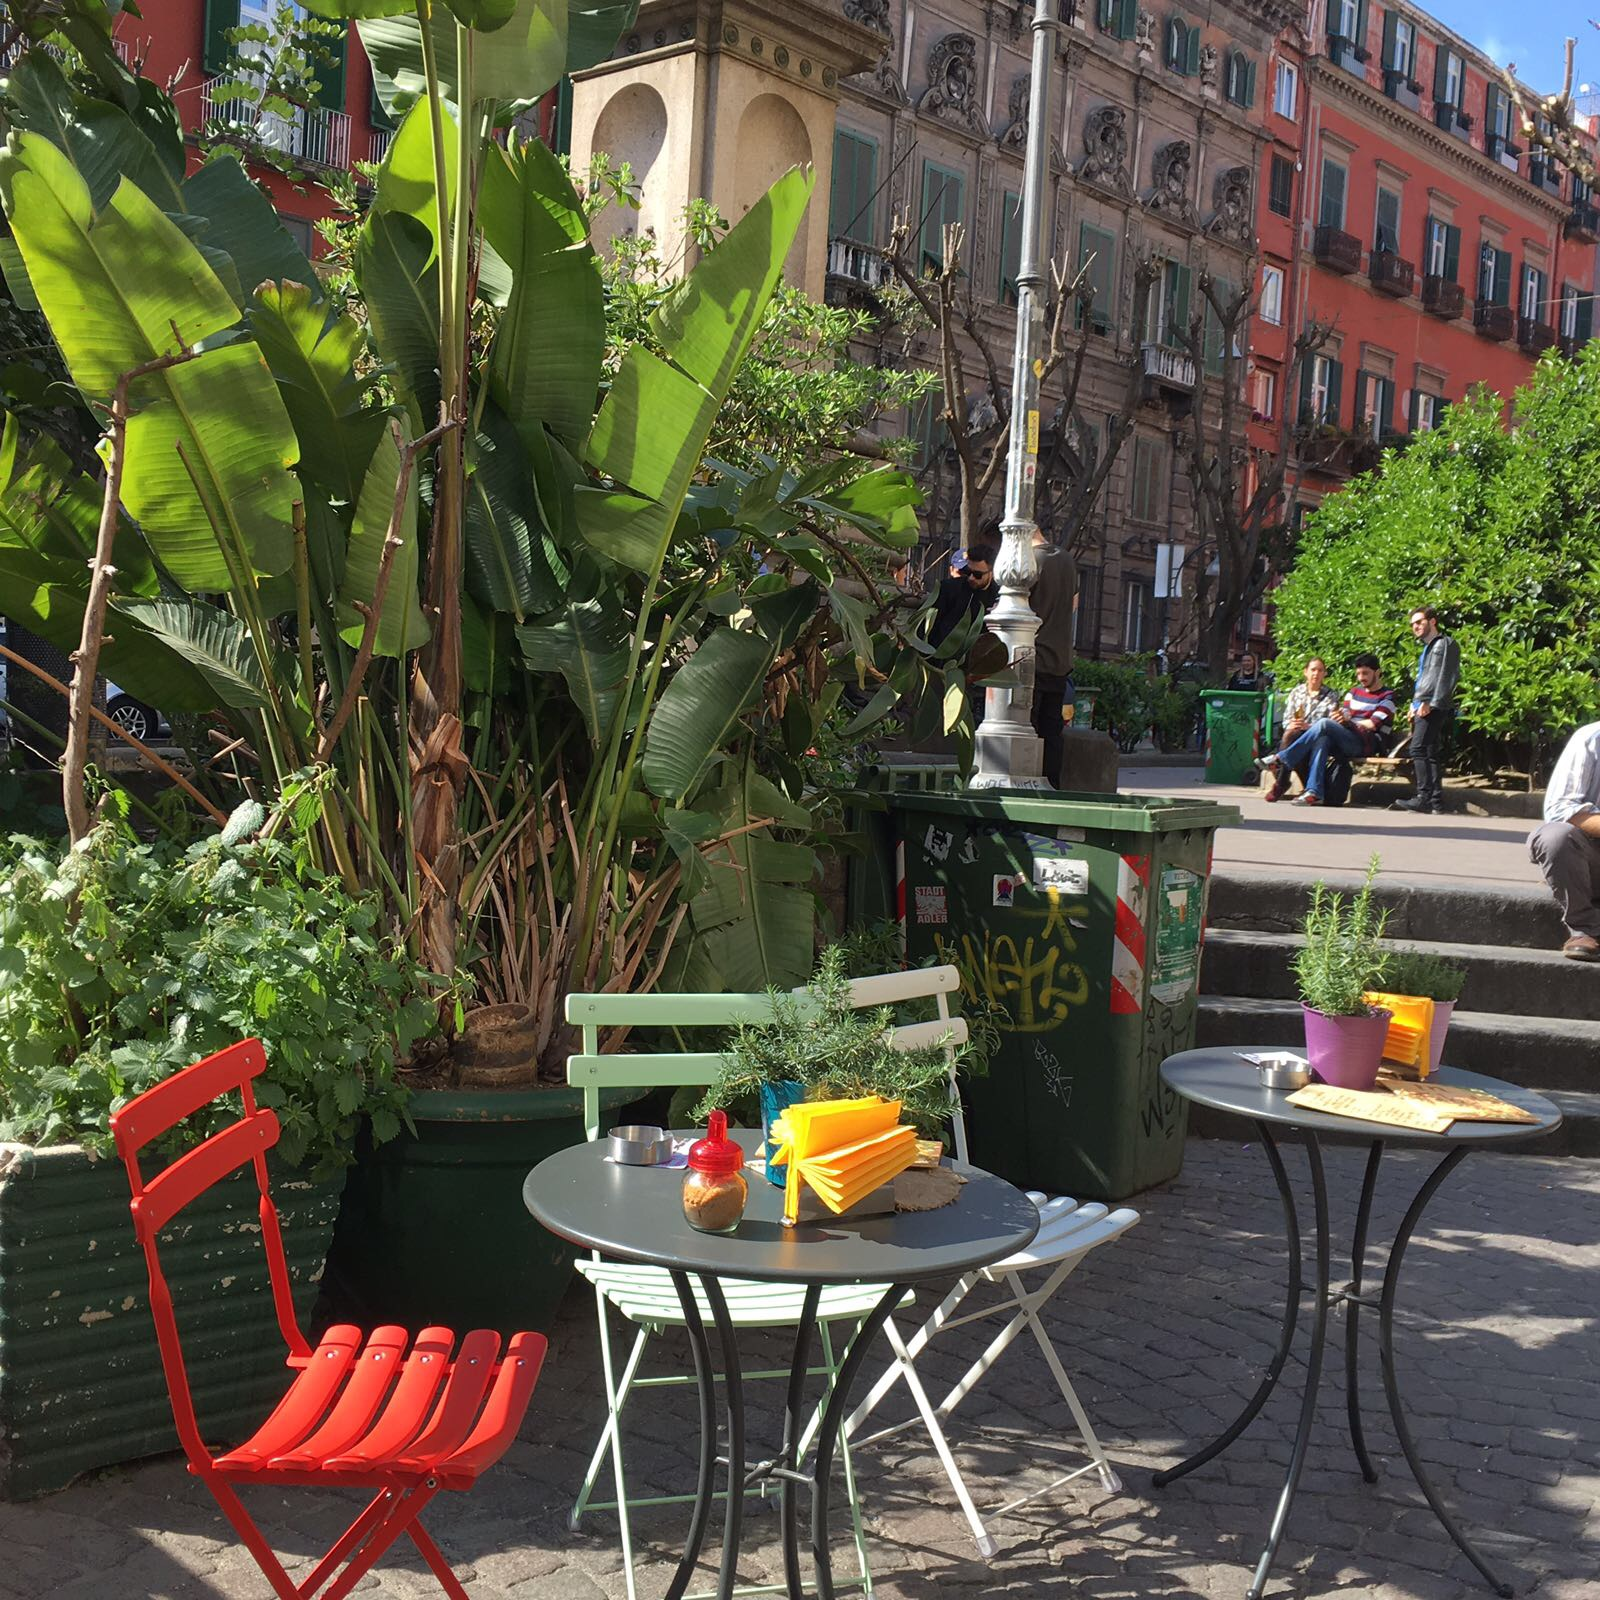 TUI-Berlin-Reisebüro-Italien-Neapel-Reiseblog-Joerg-Kastner-World-of-TUI